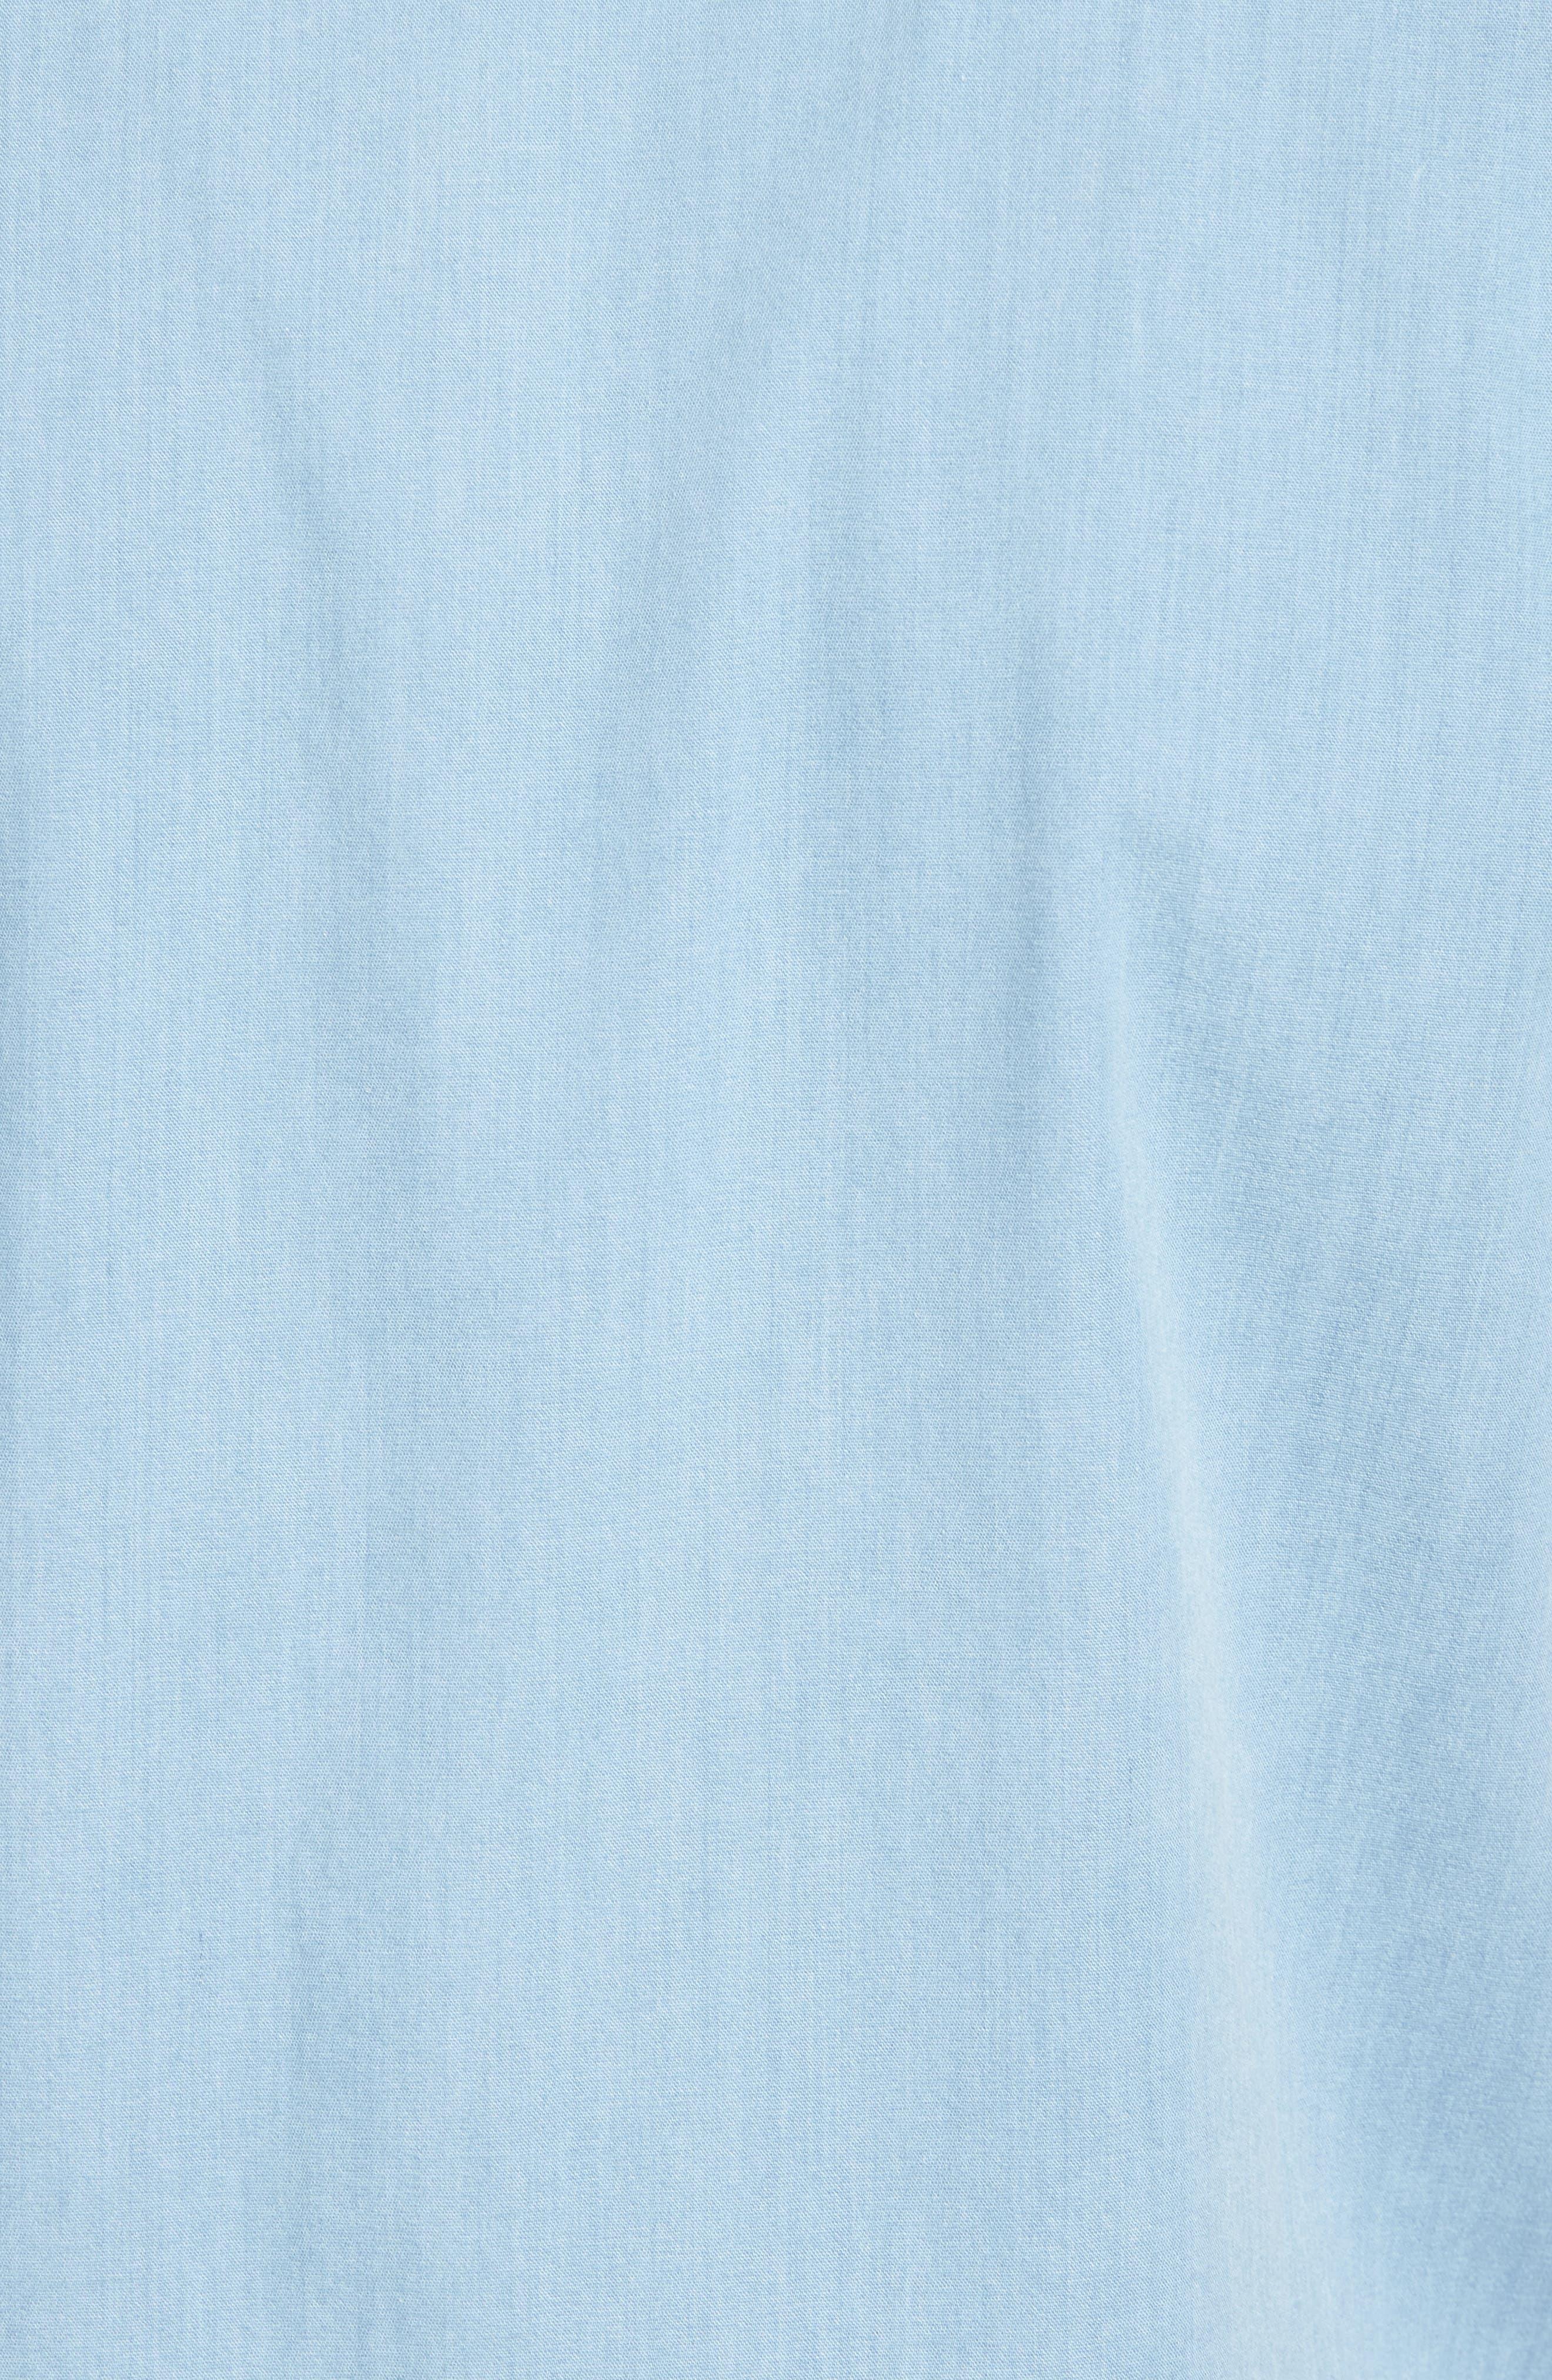 Workwear Trim Fit Stretch Denim Shirt,                             Alternate thumbnail 5, color,                             Blue Light Chambray